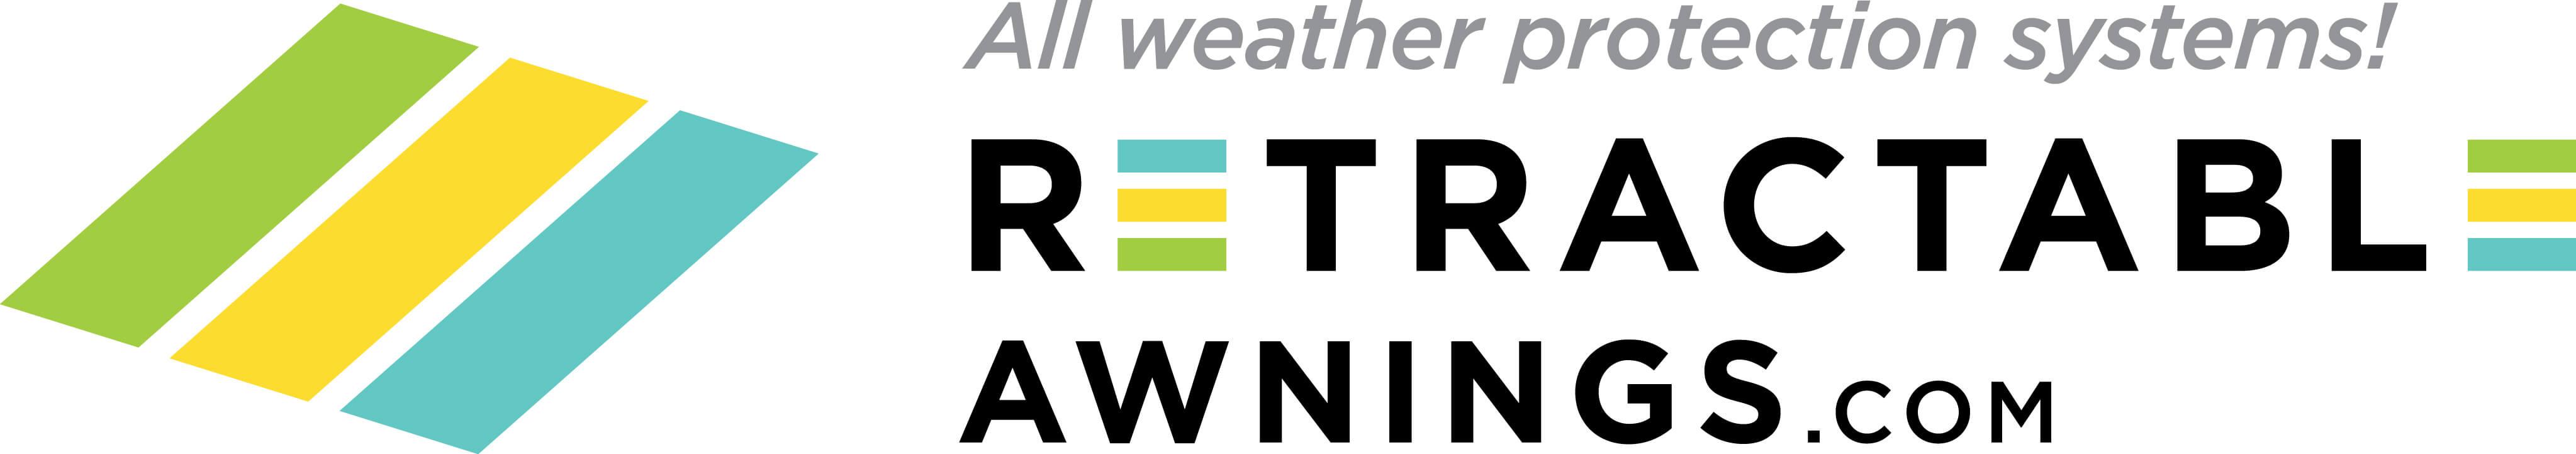 new retractableawnings.com logo horizontal